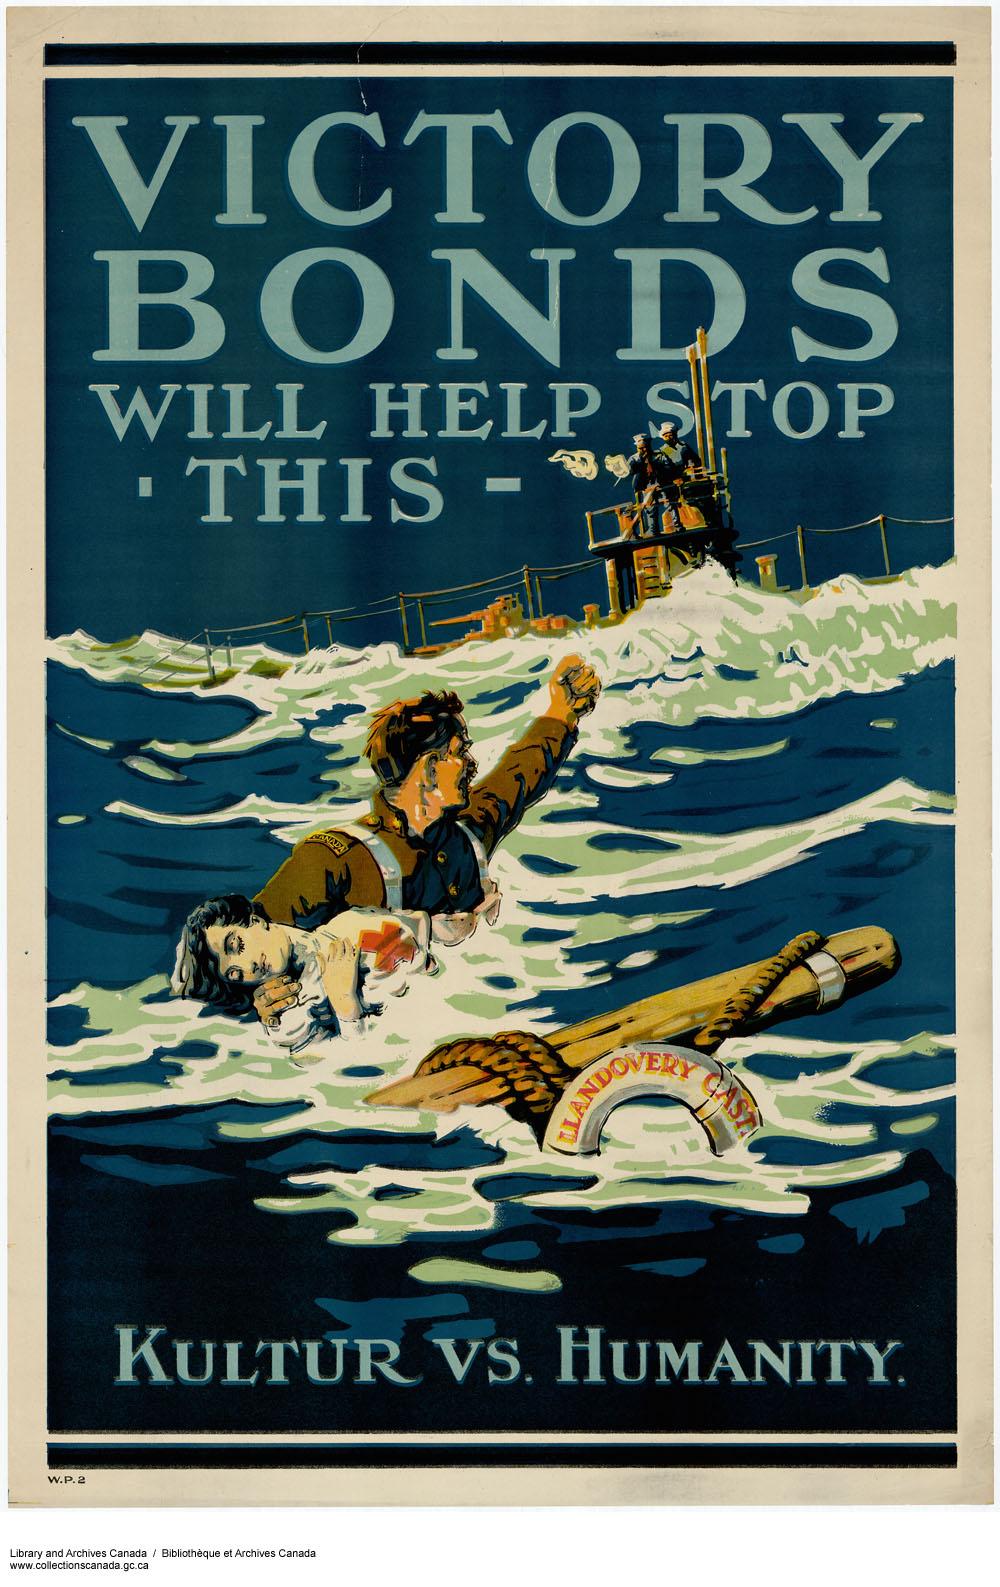 Canada and Antisubmarine Warfare in the First World War